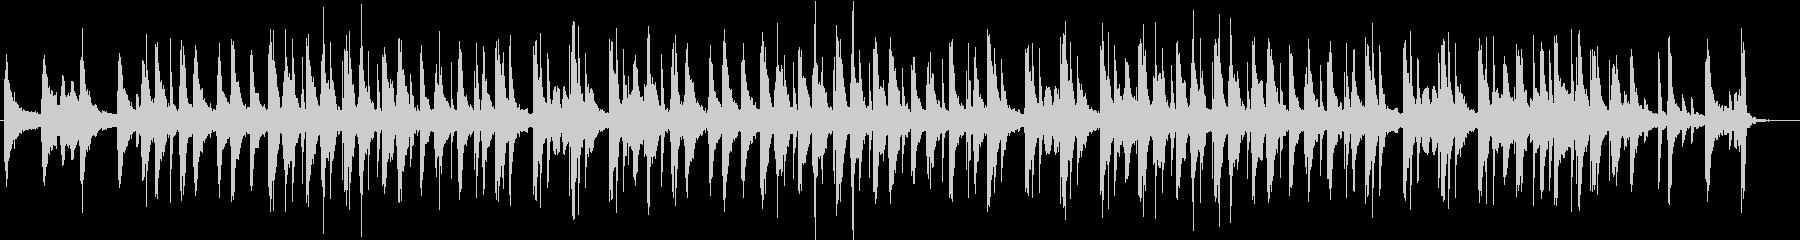 Nostalgia Faded slow electronica's unreproduced waveform